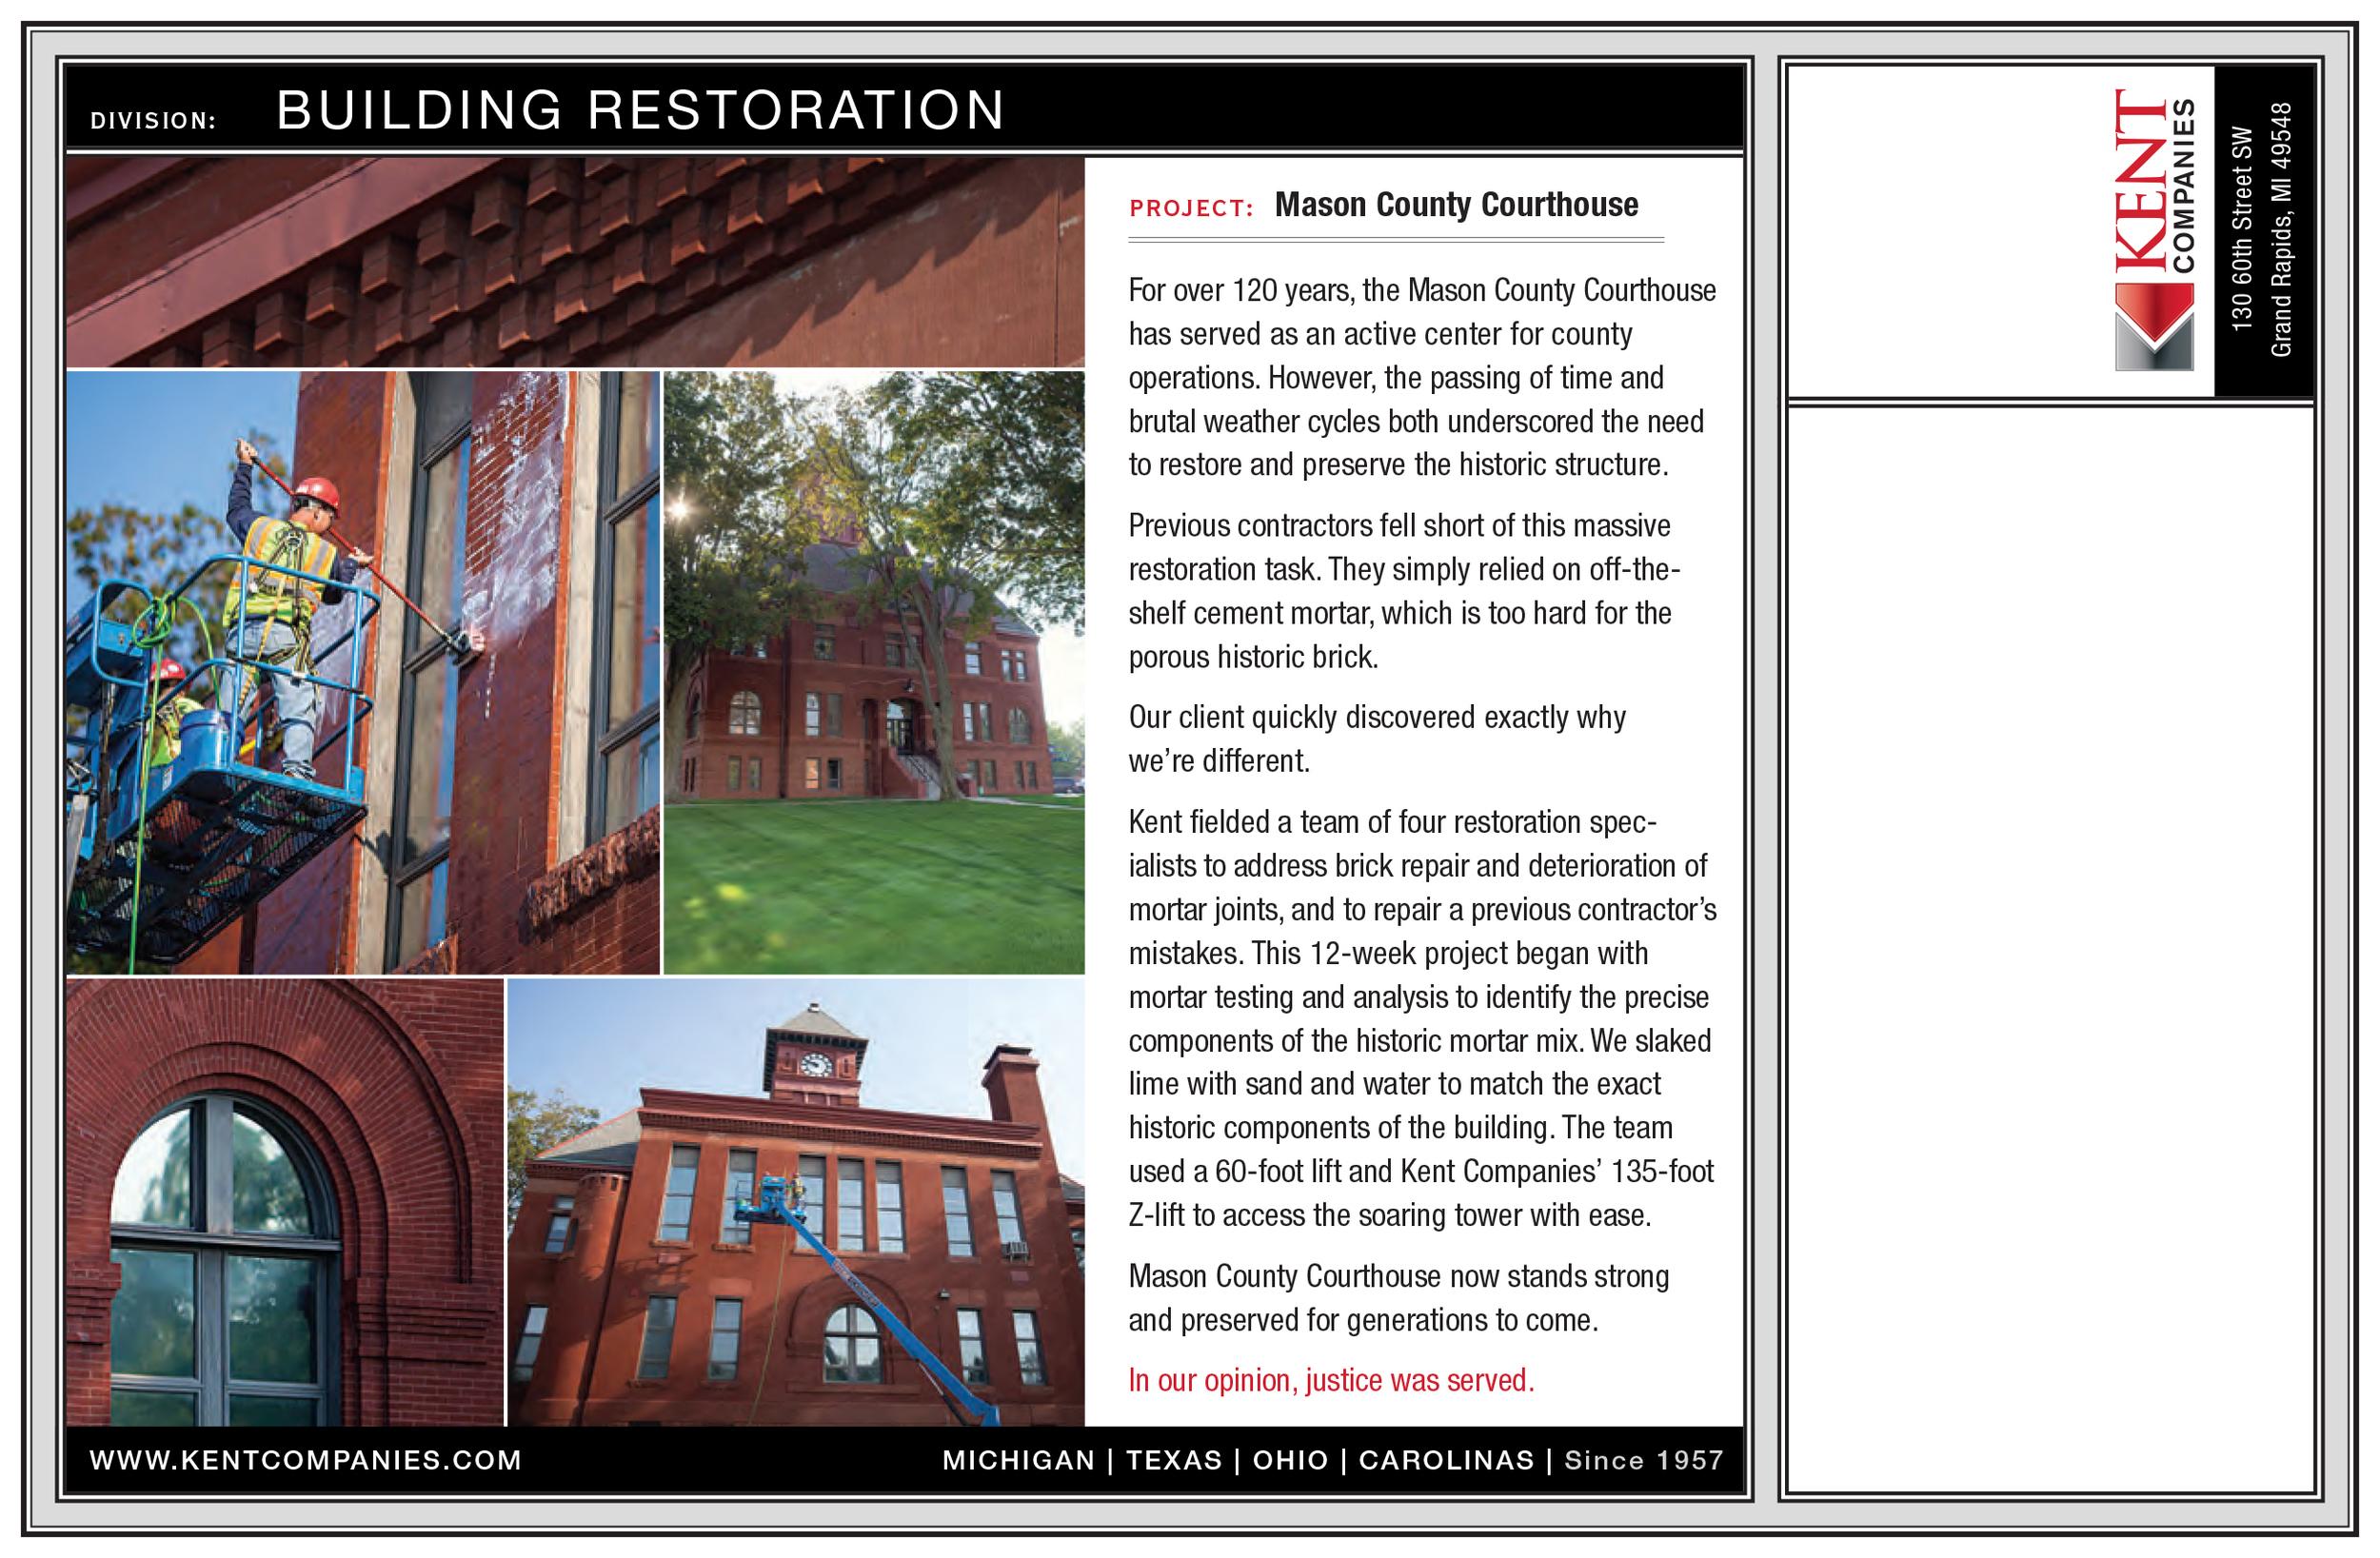 KENT Bldg Restoration Postcard - Email-2.jpg